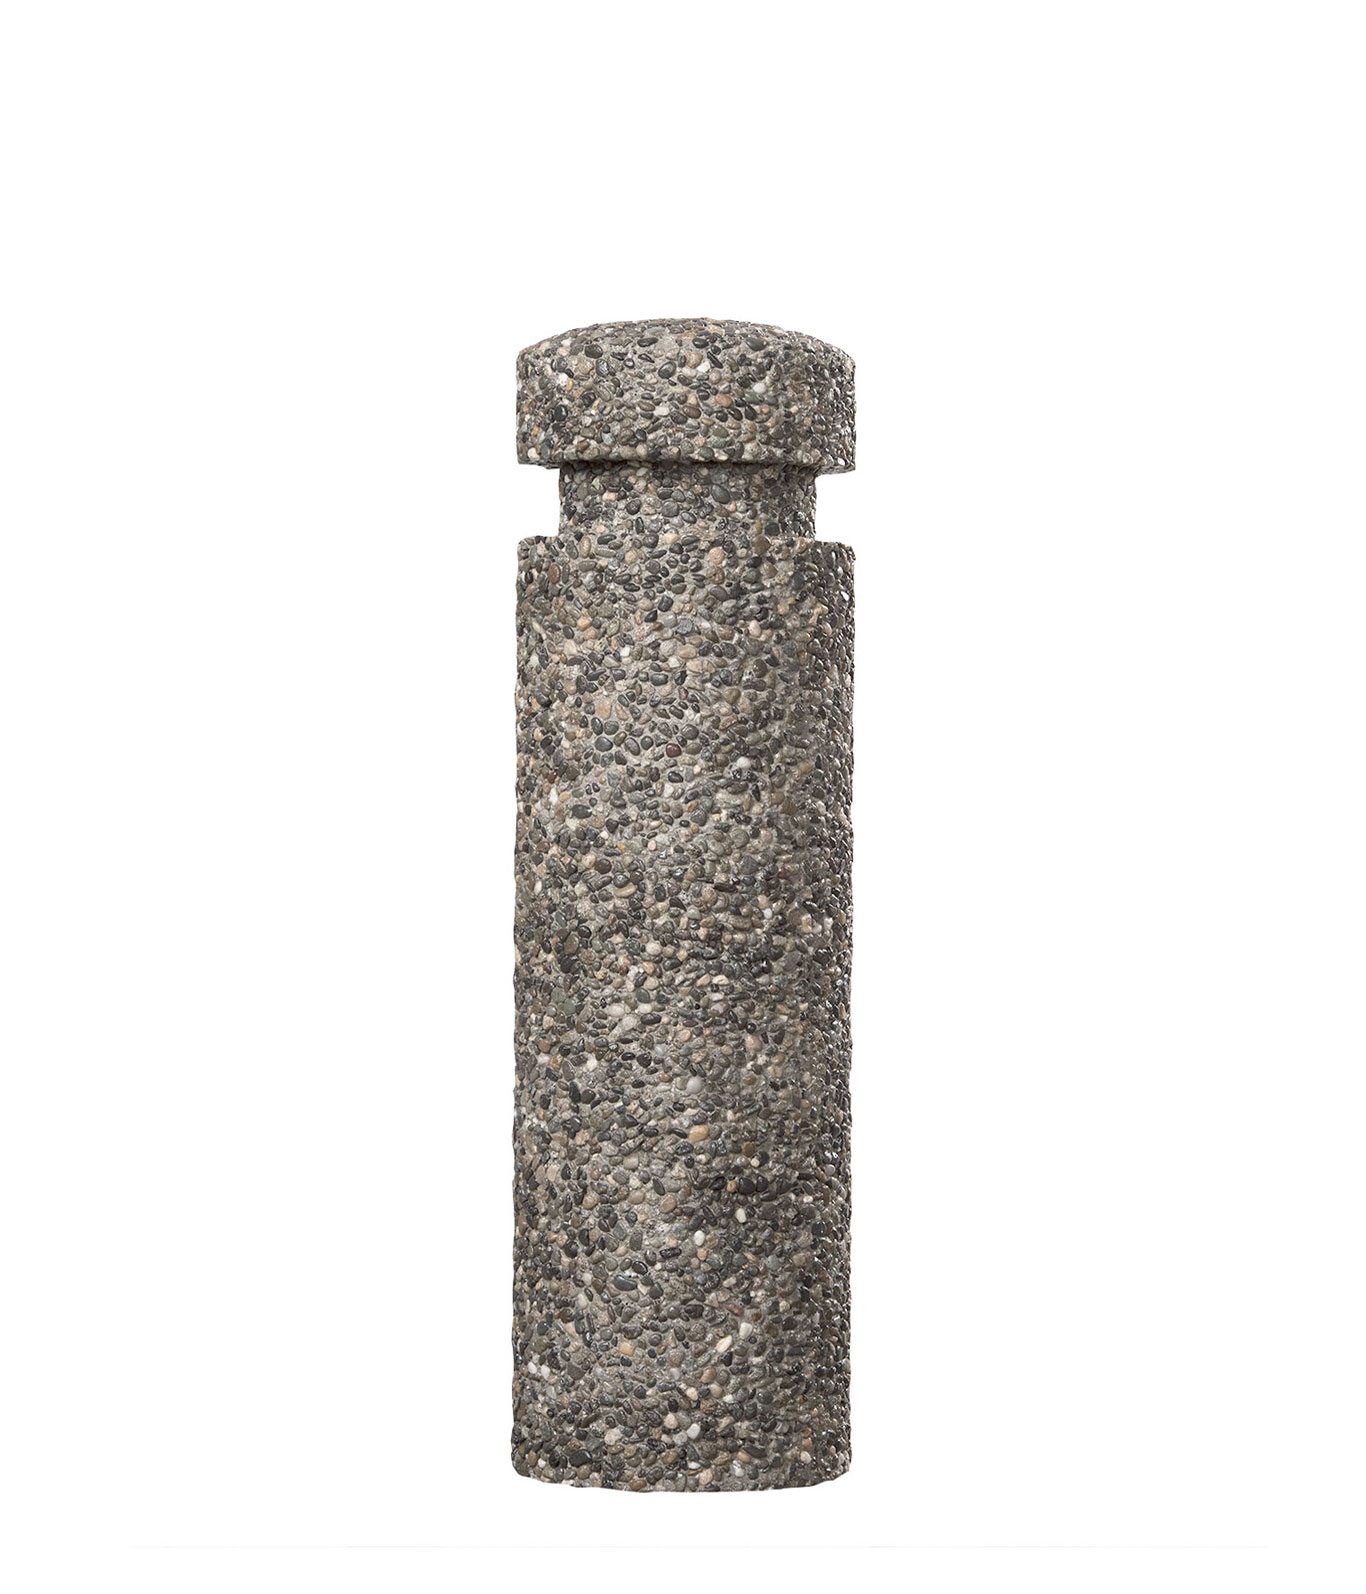 R-9705 concrete bollards